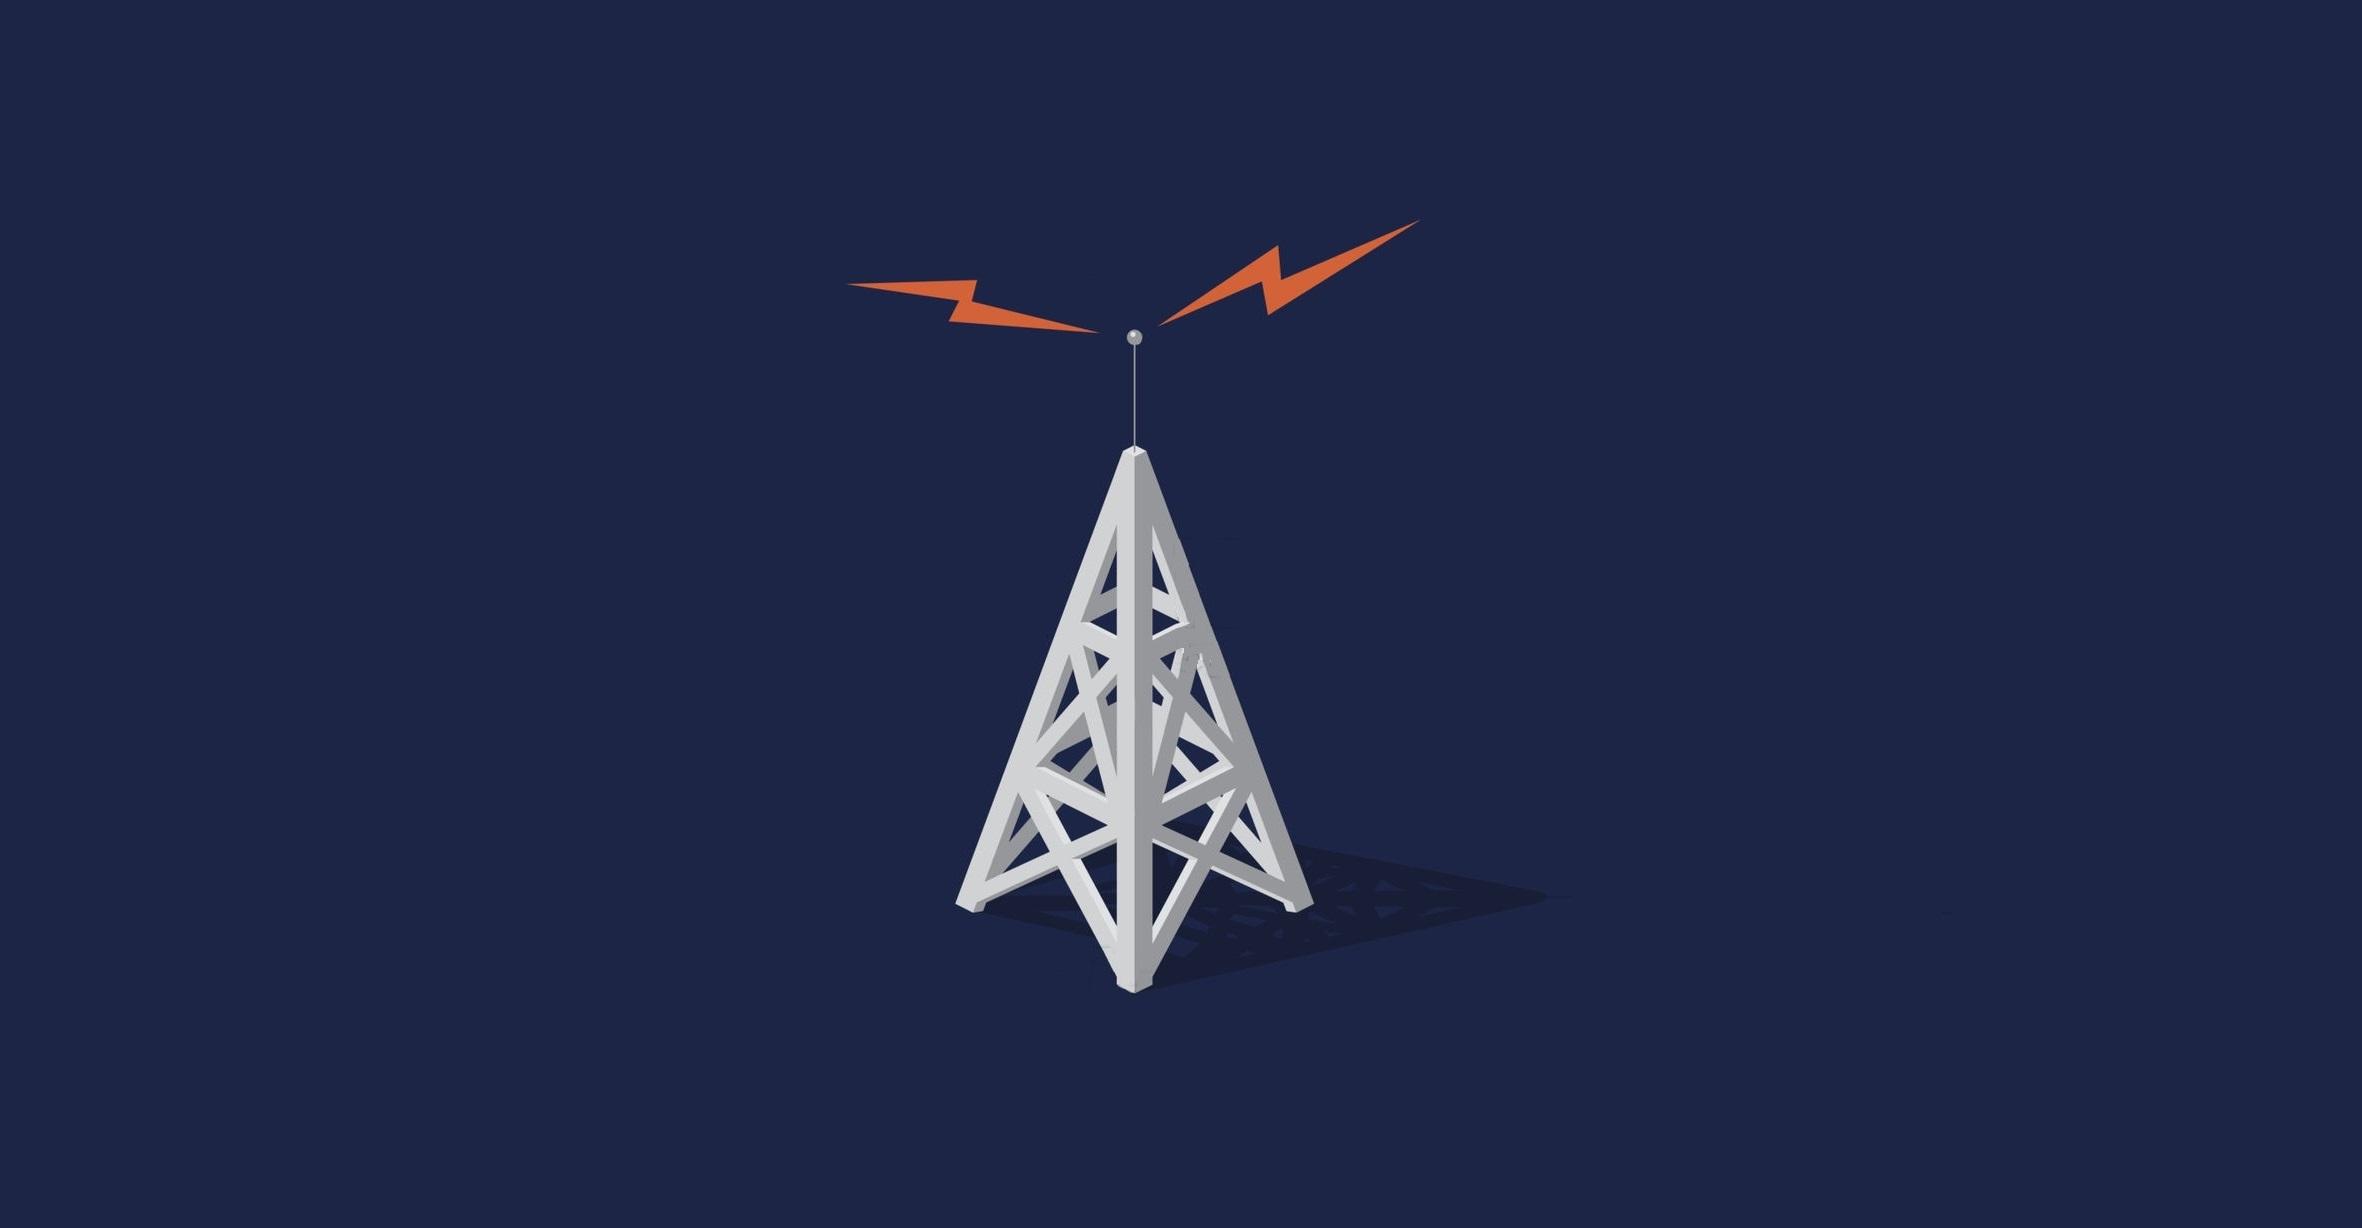 Radio towers with orange frequencies